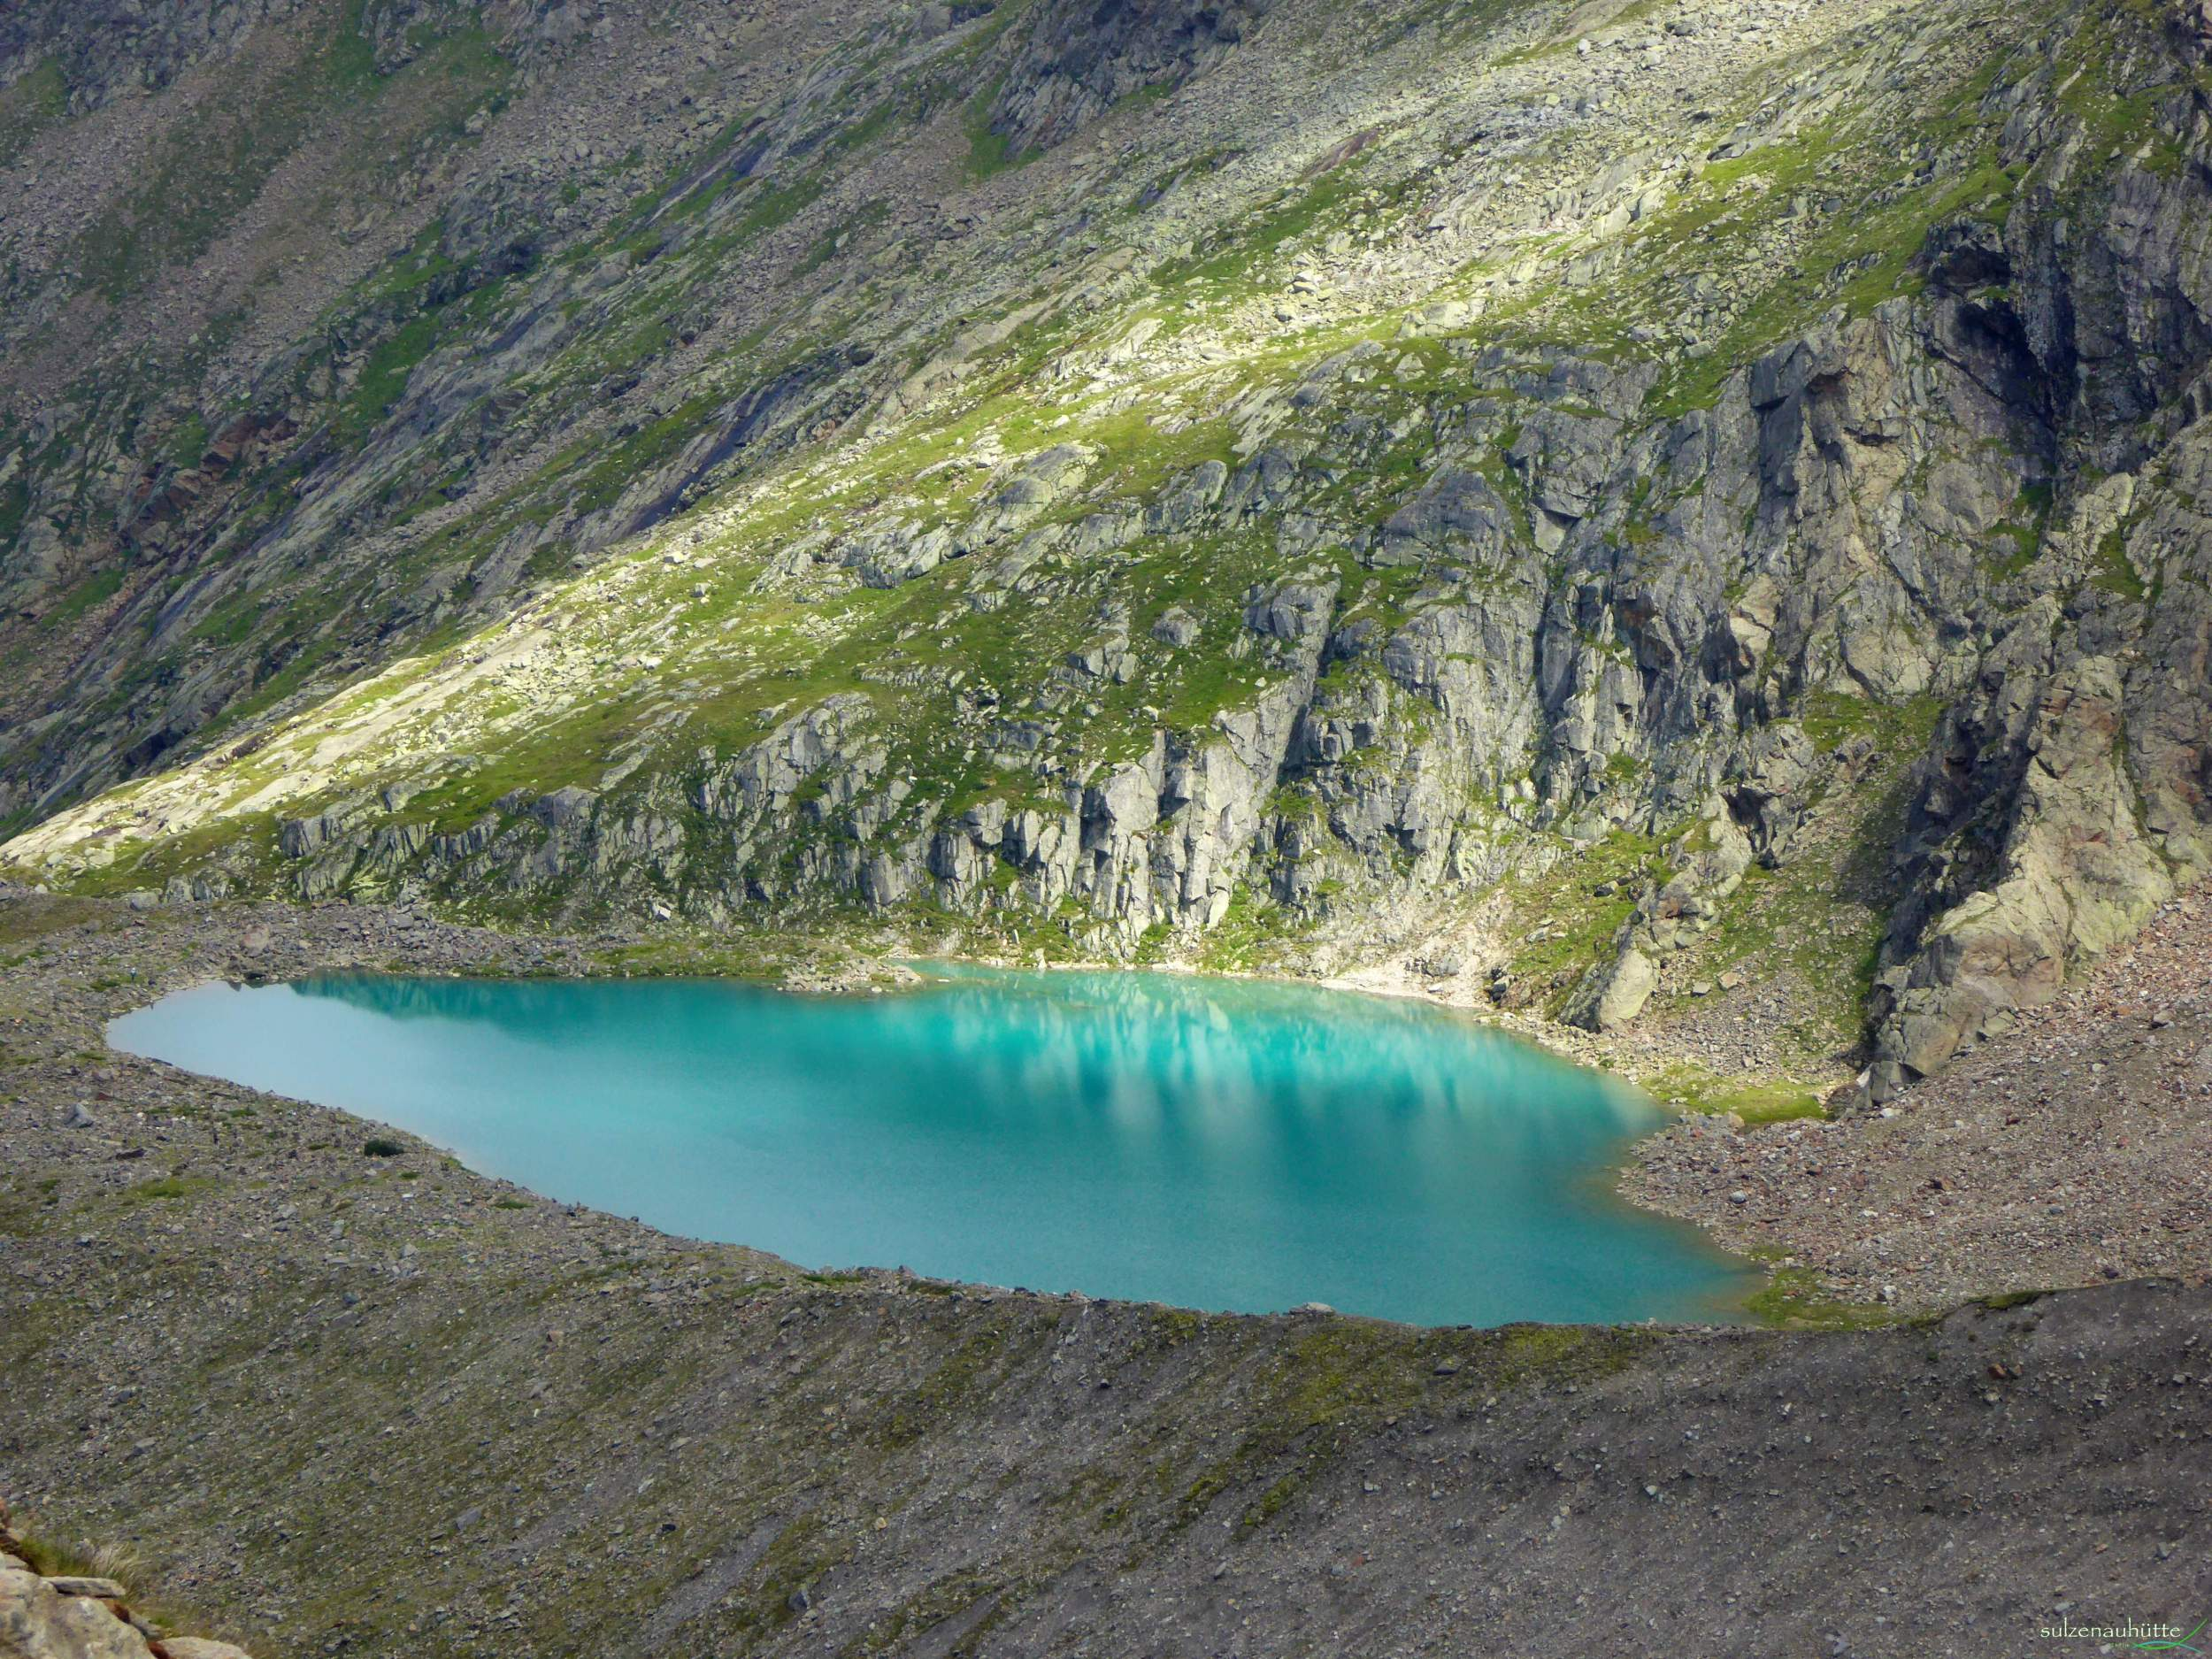 Blue Lake - Stubai High Trail